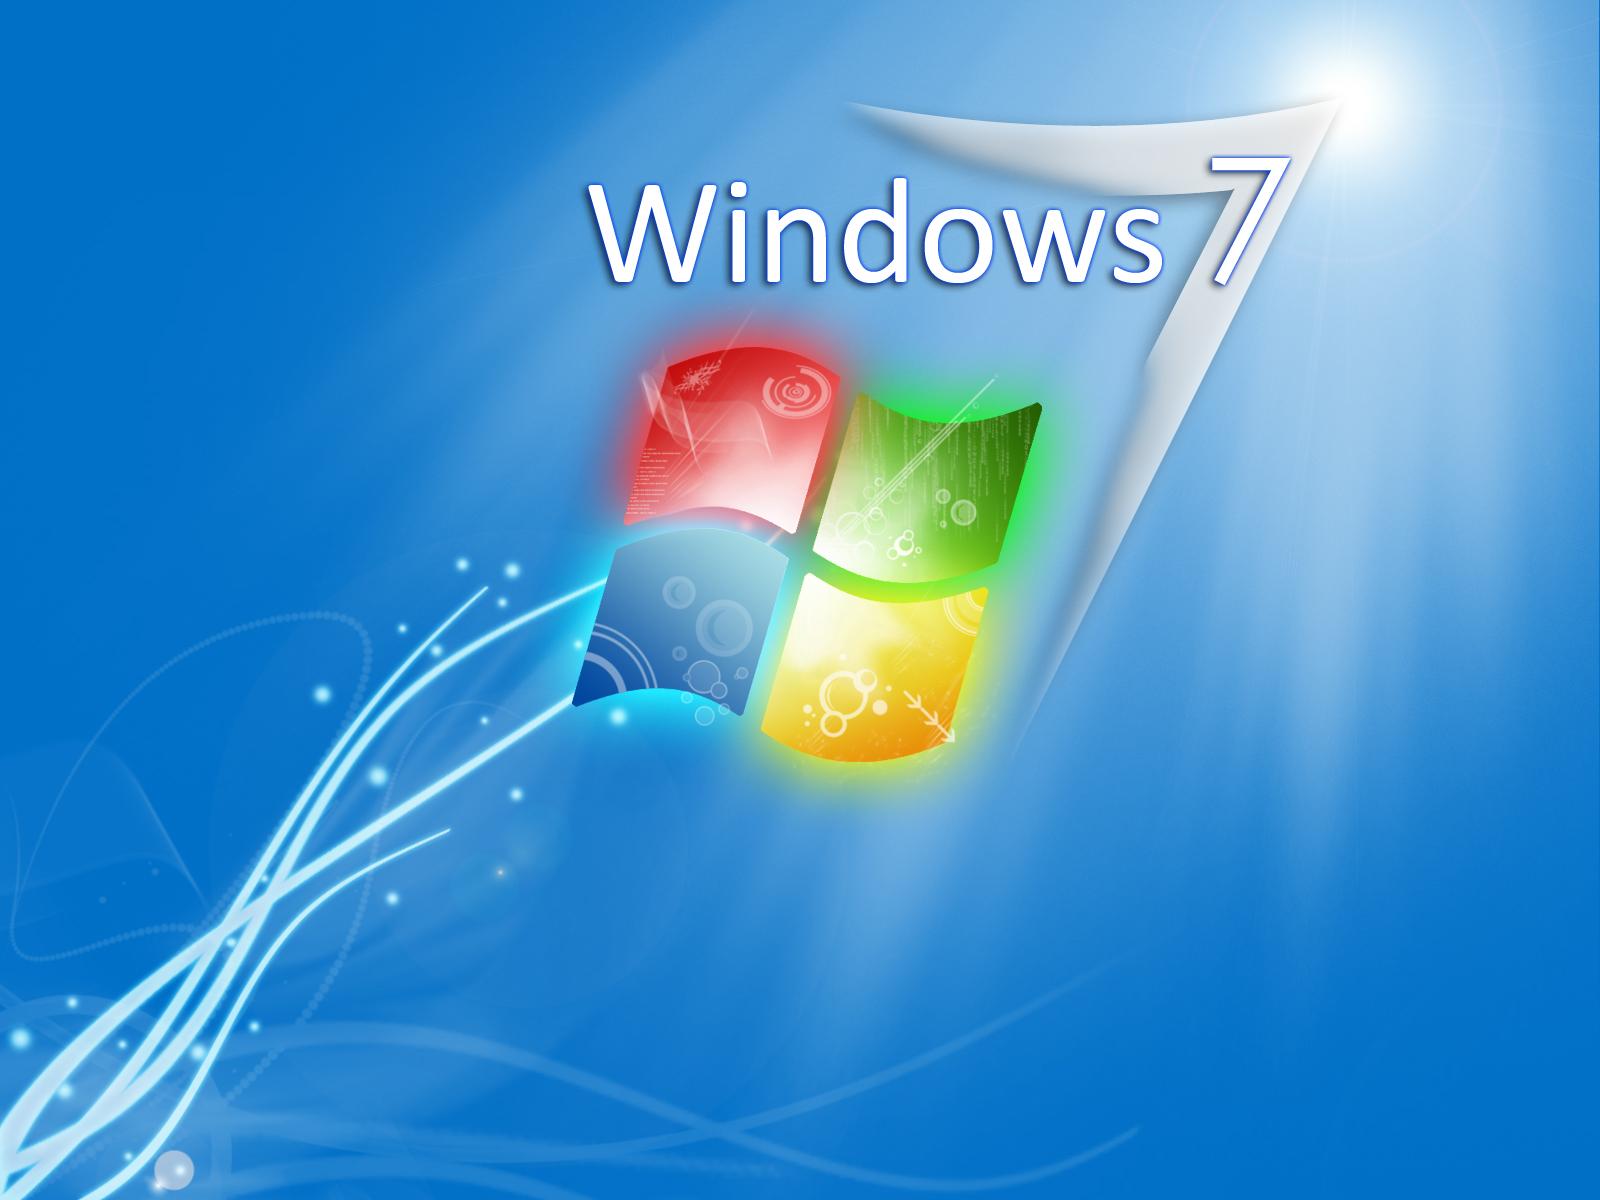 Wallpaper Windows 7 2012 Download Wallpaper 1600x1200